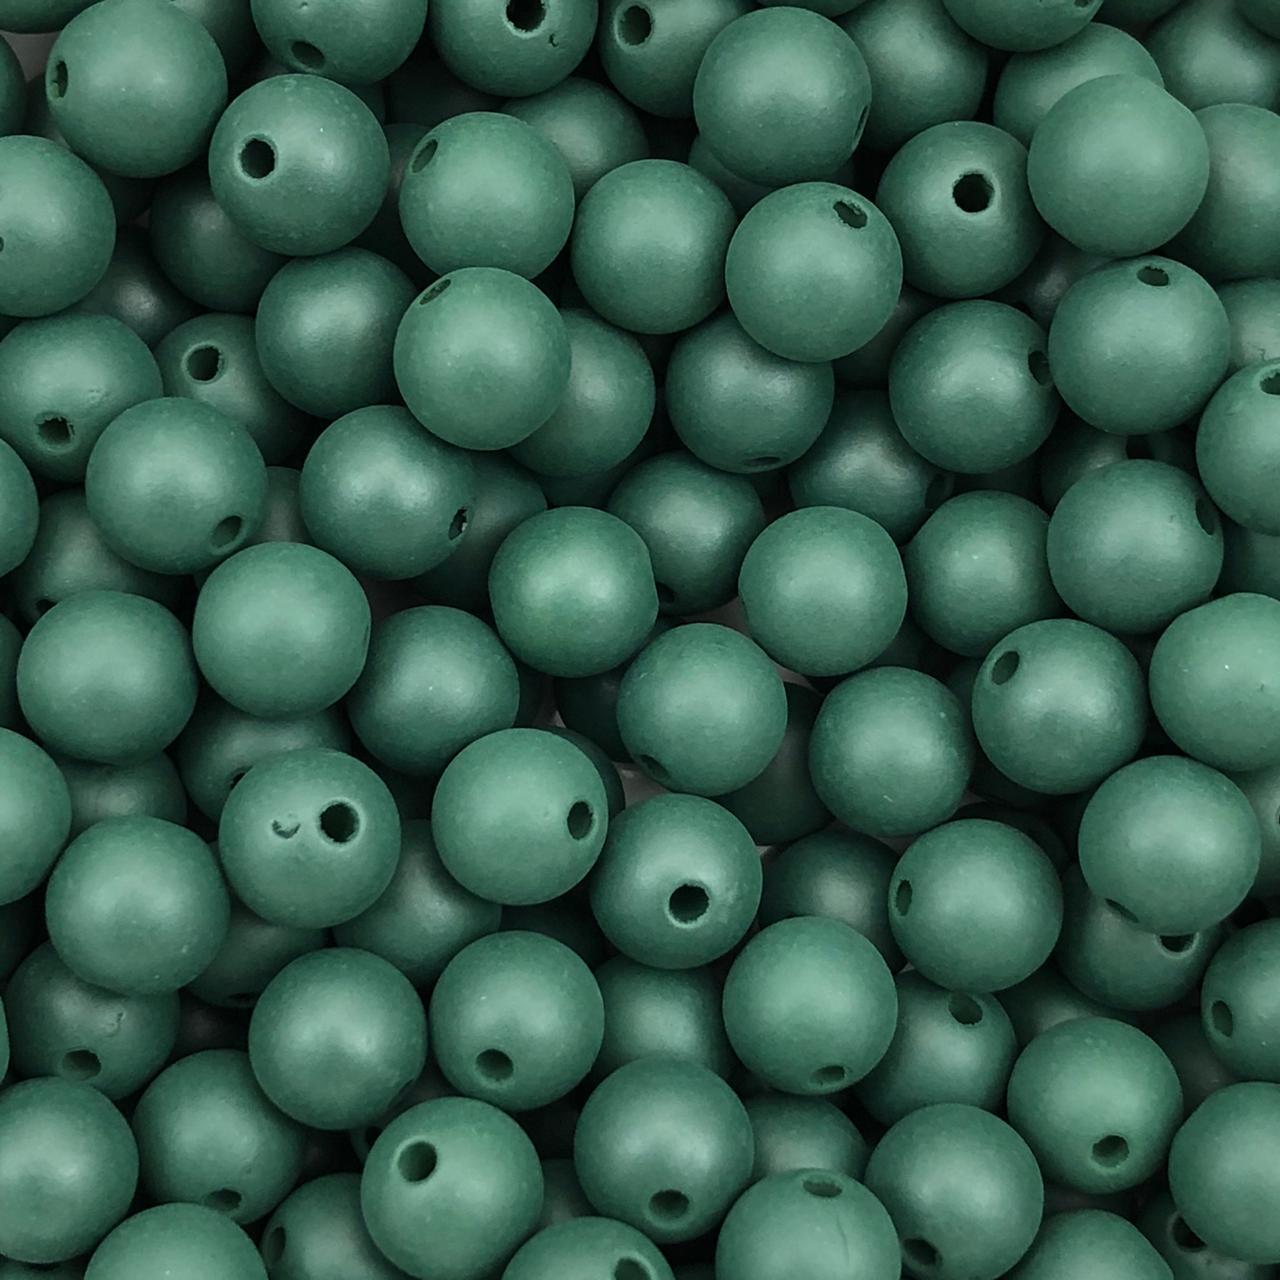 BOL621 - Bola Plástica Fosca Verde Bandeira 8mm - 20Grs